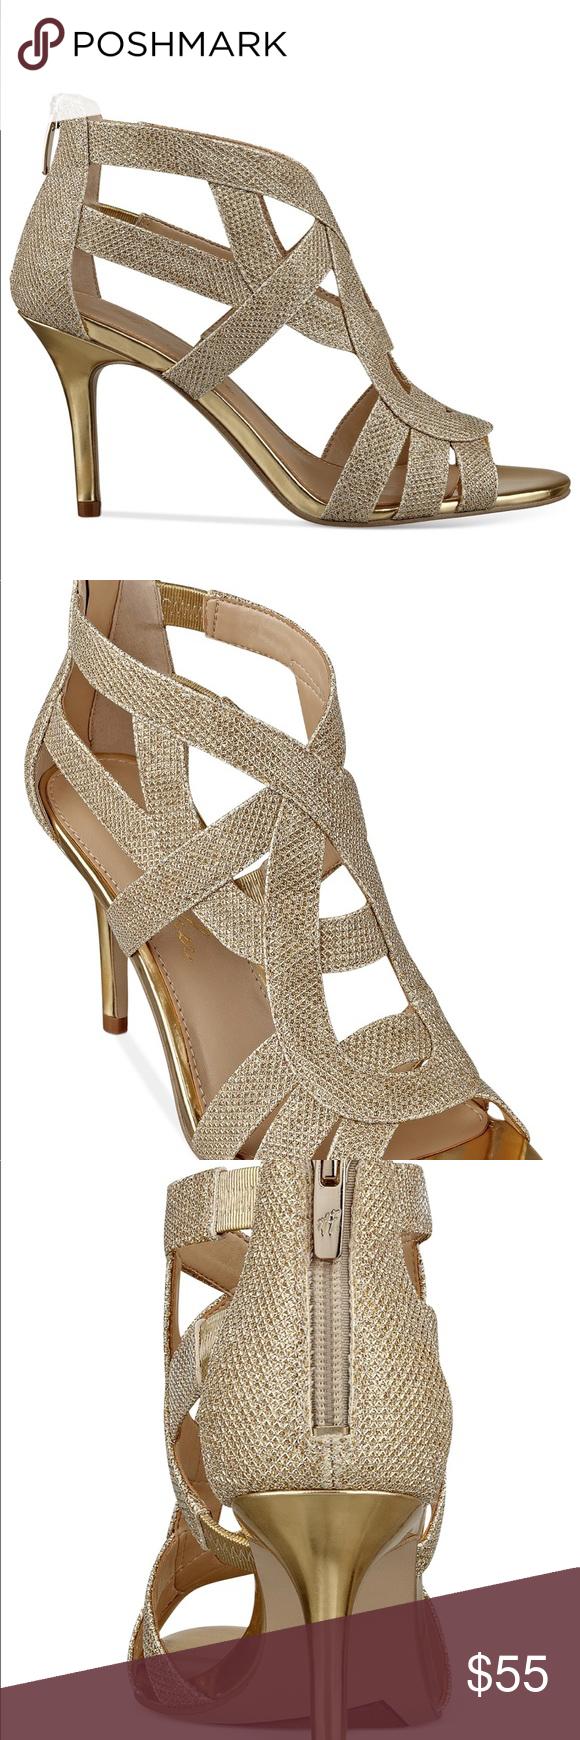 dba1908f15de Marc Fisher Nala Evening Sandal Gold 6.5 Marc Fisher Nala Mid Heel Evening  Sandals Gold -